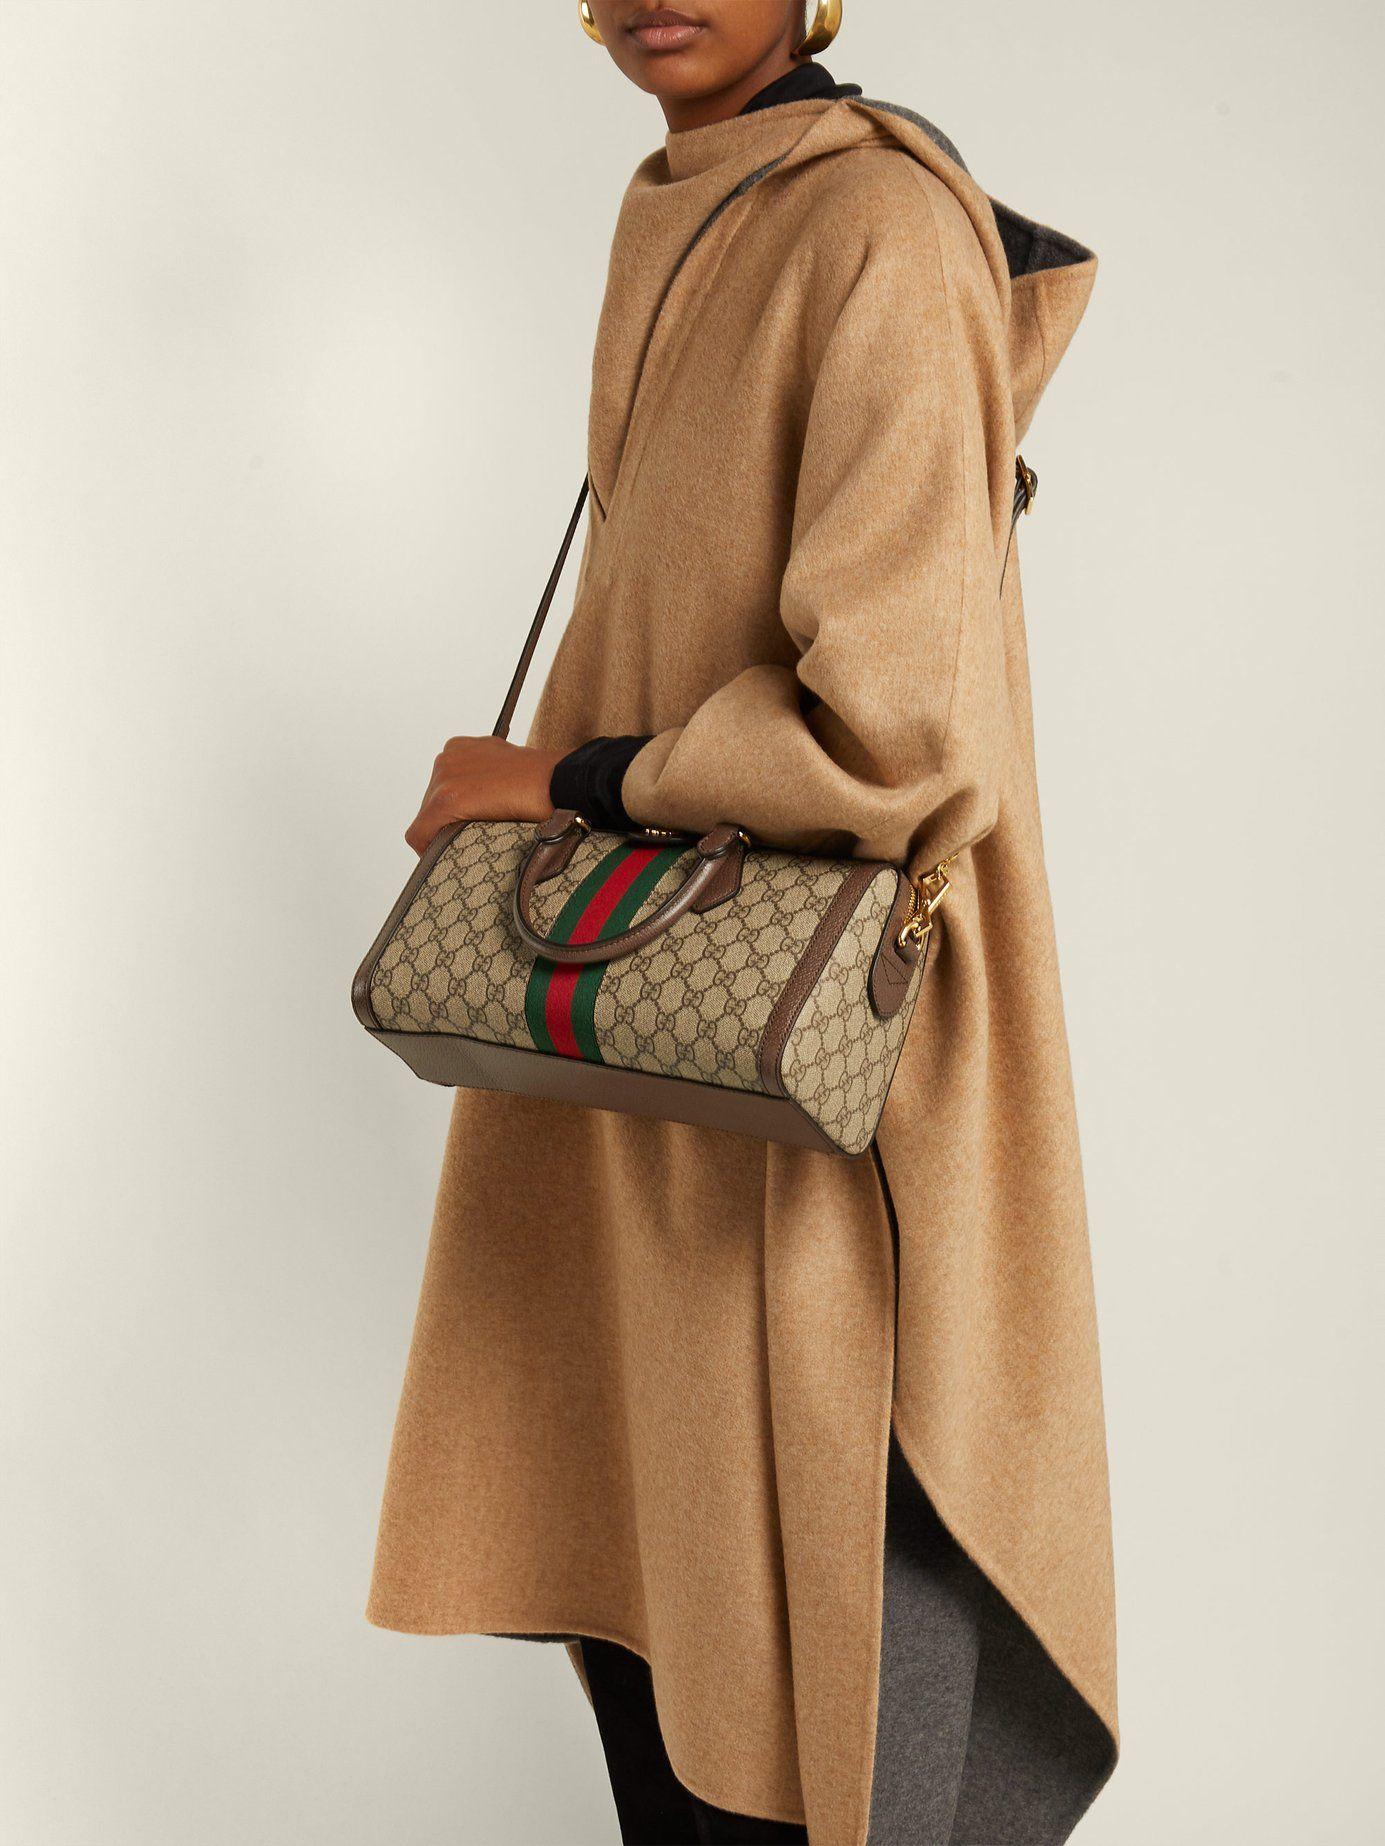 0e5fdbbfd9dc25 Ophidia Boston GG Supreme bag | Gucci | MATCHESFASHION.COM UK ...